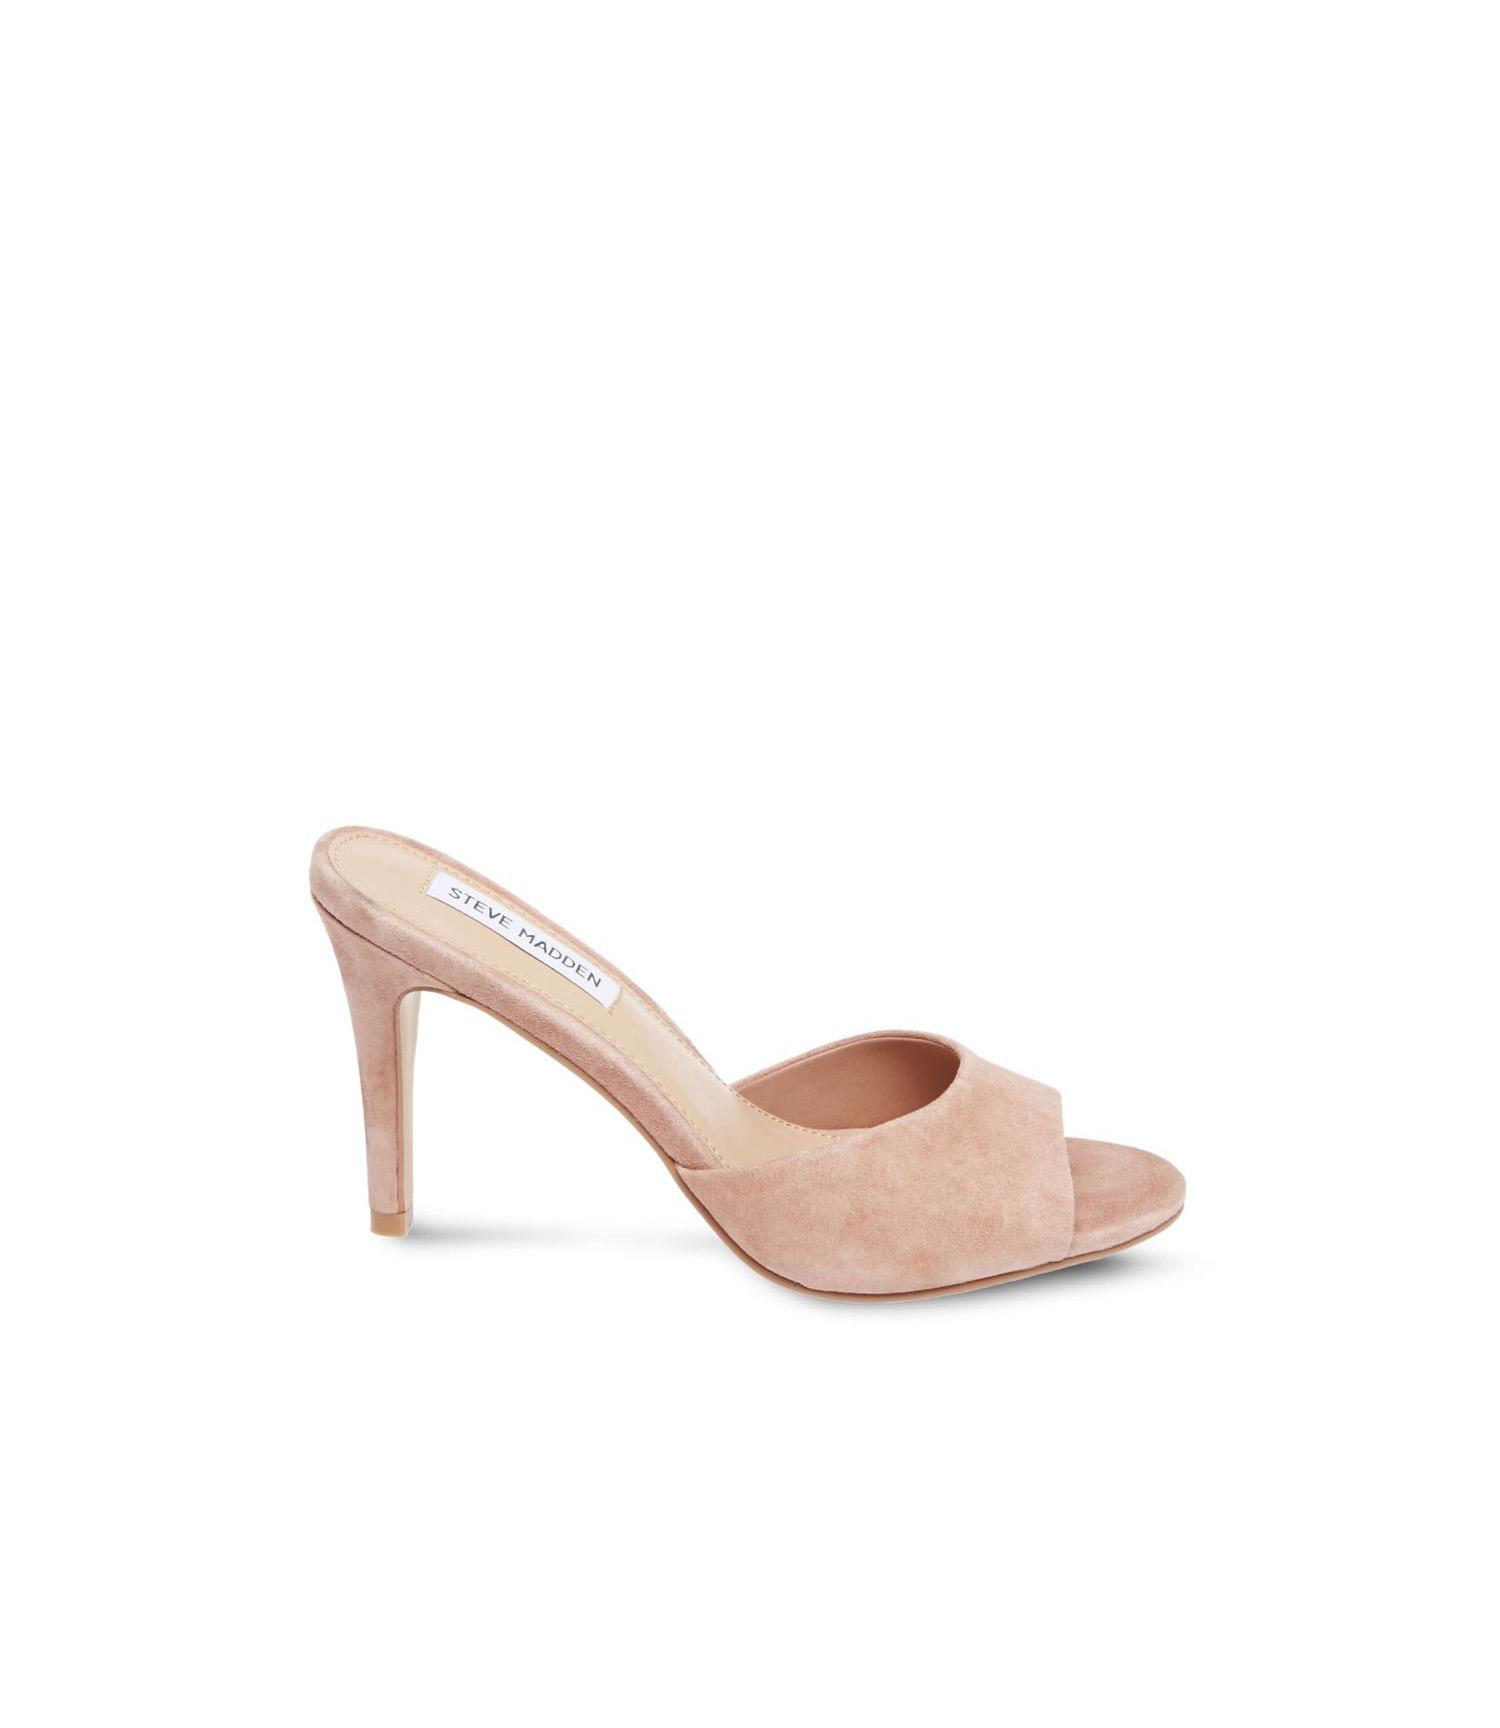 nude shoe tan suede shoes